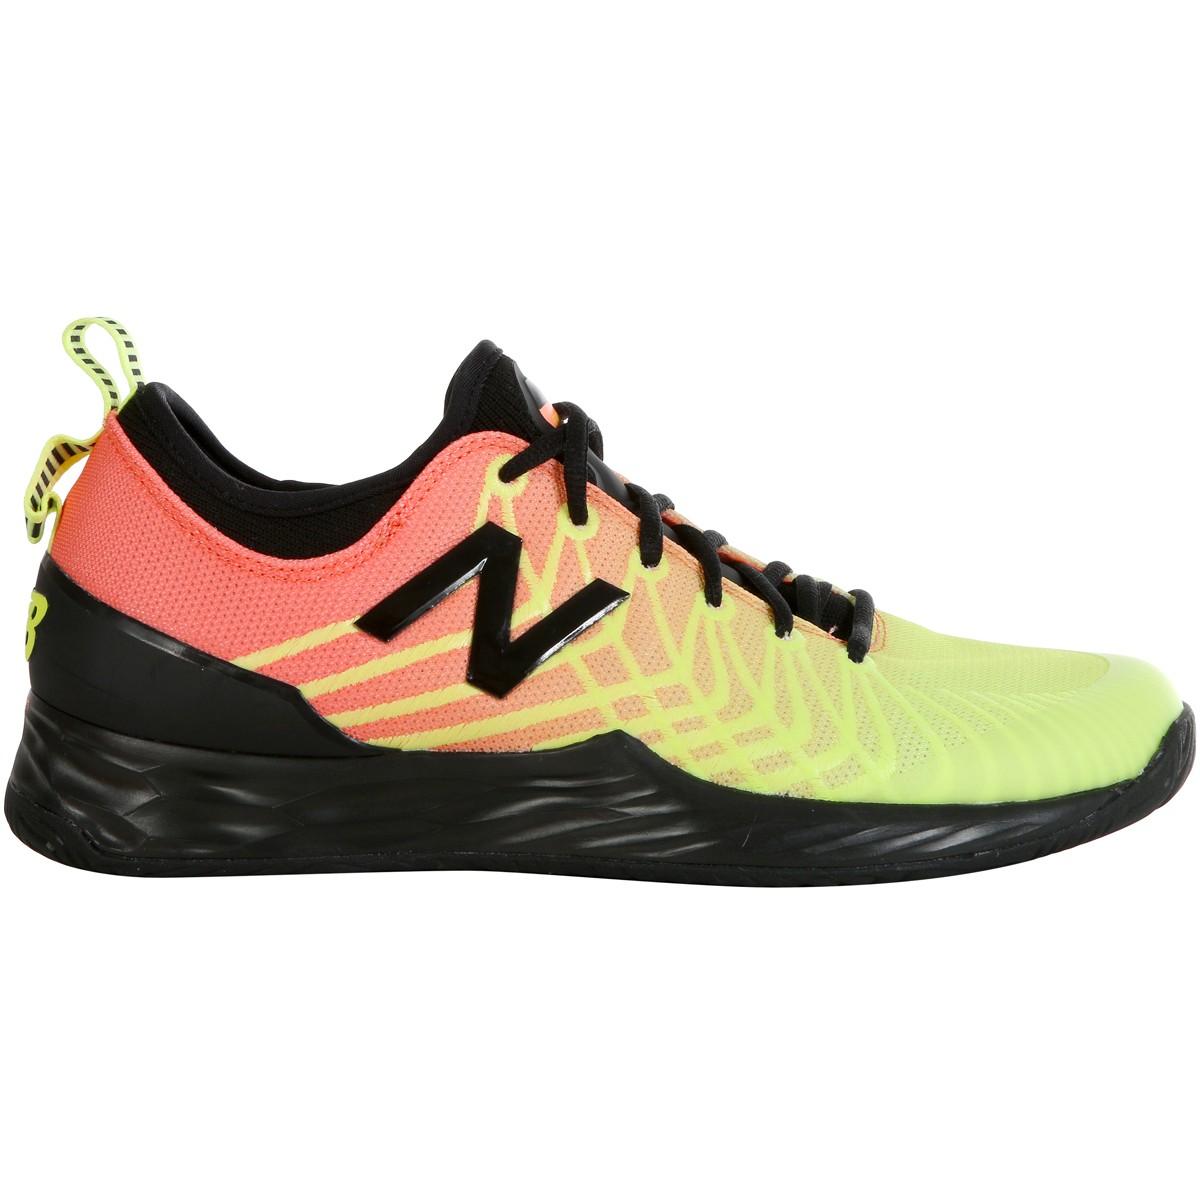 Chaussures new balance lav fresh foam miami toutes surfaces